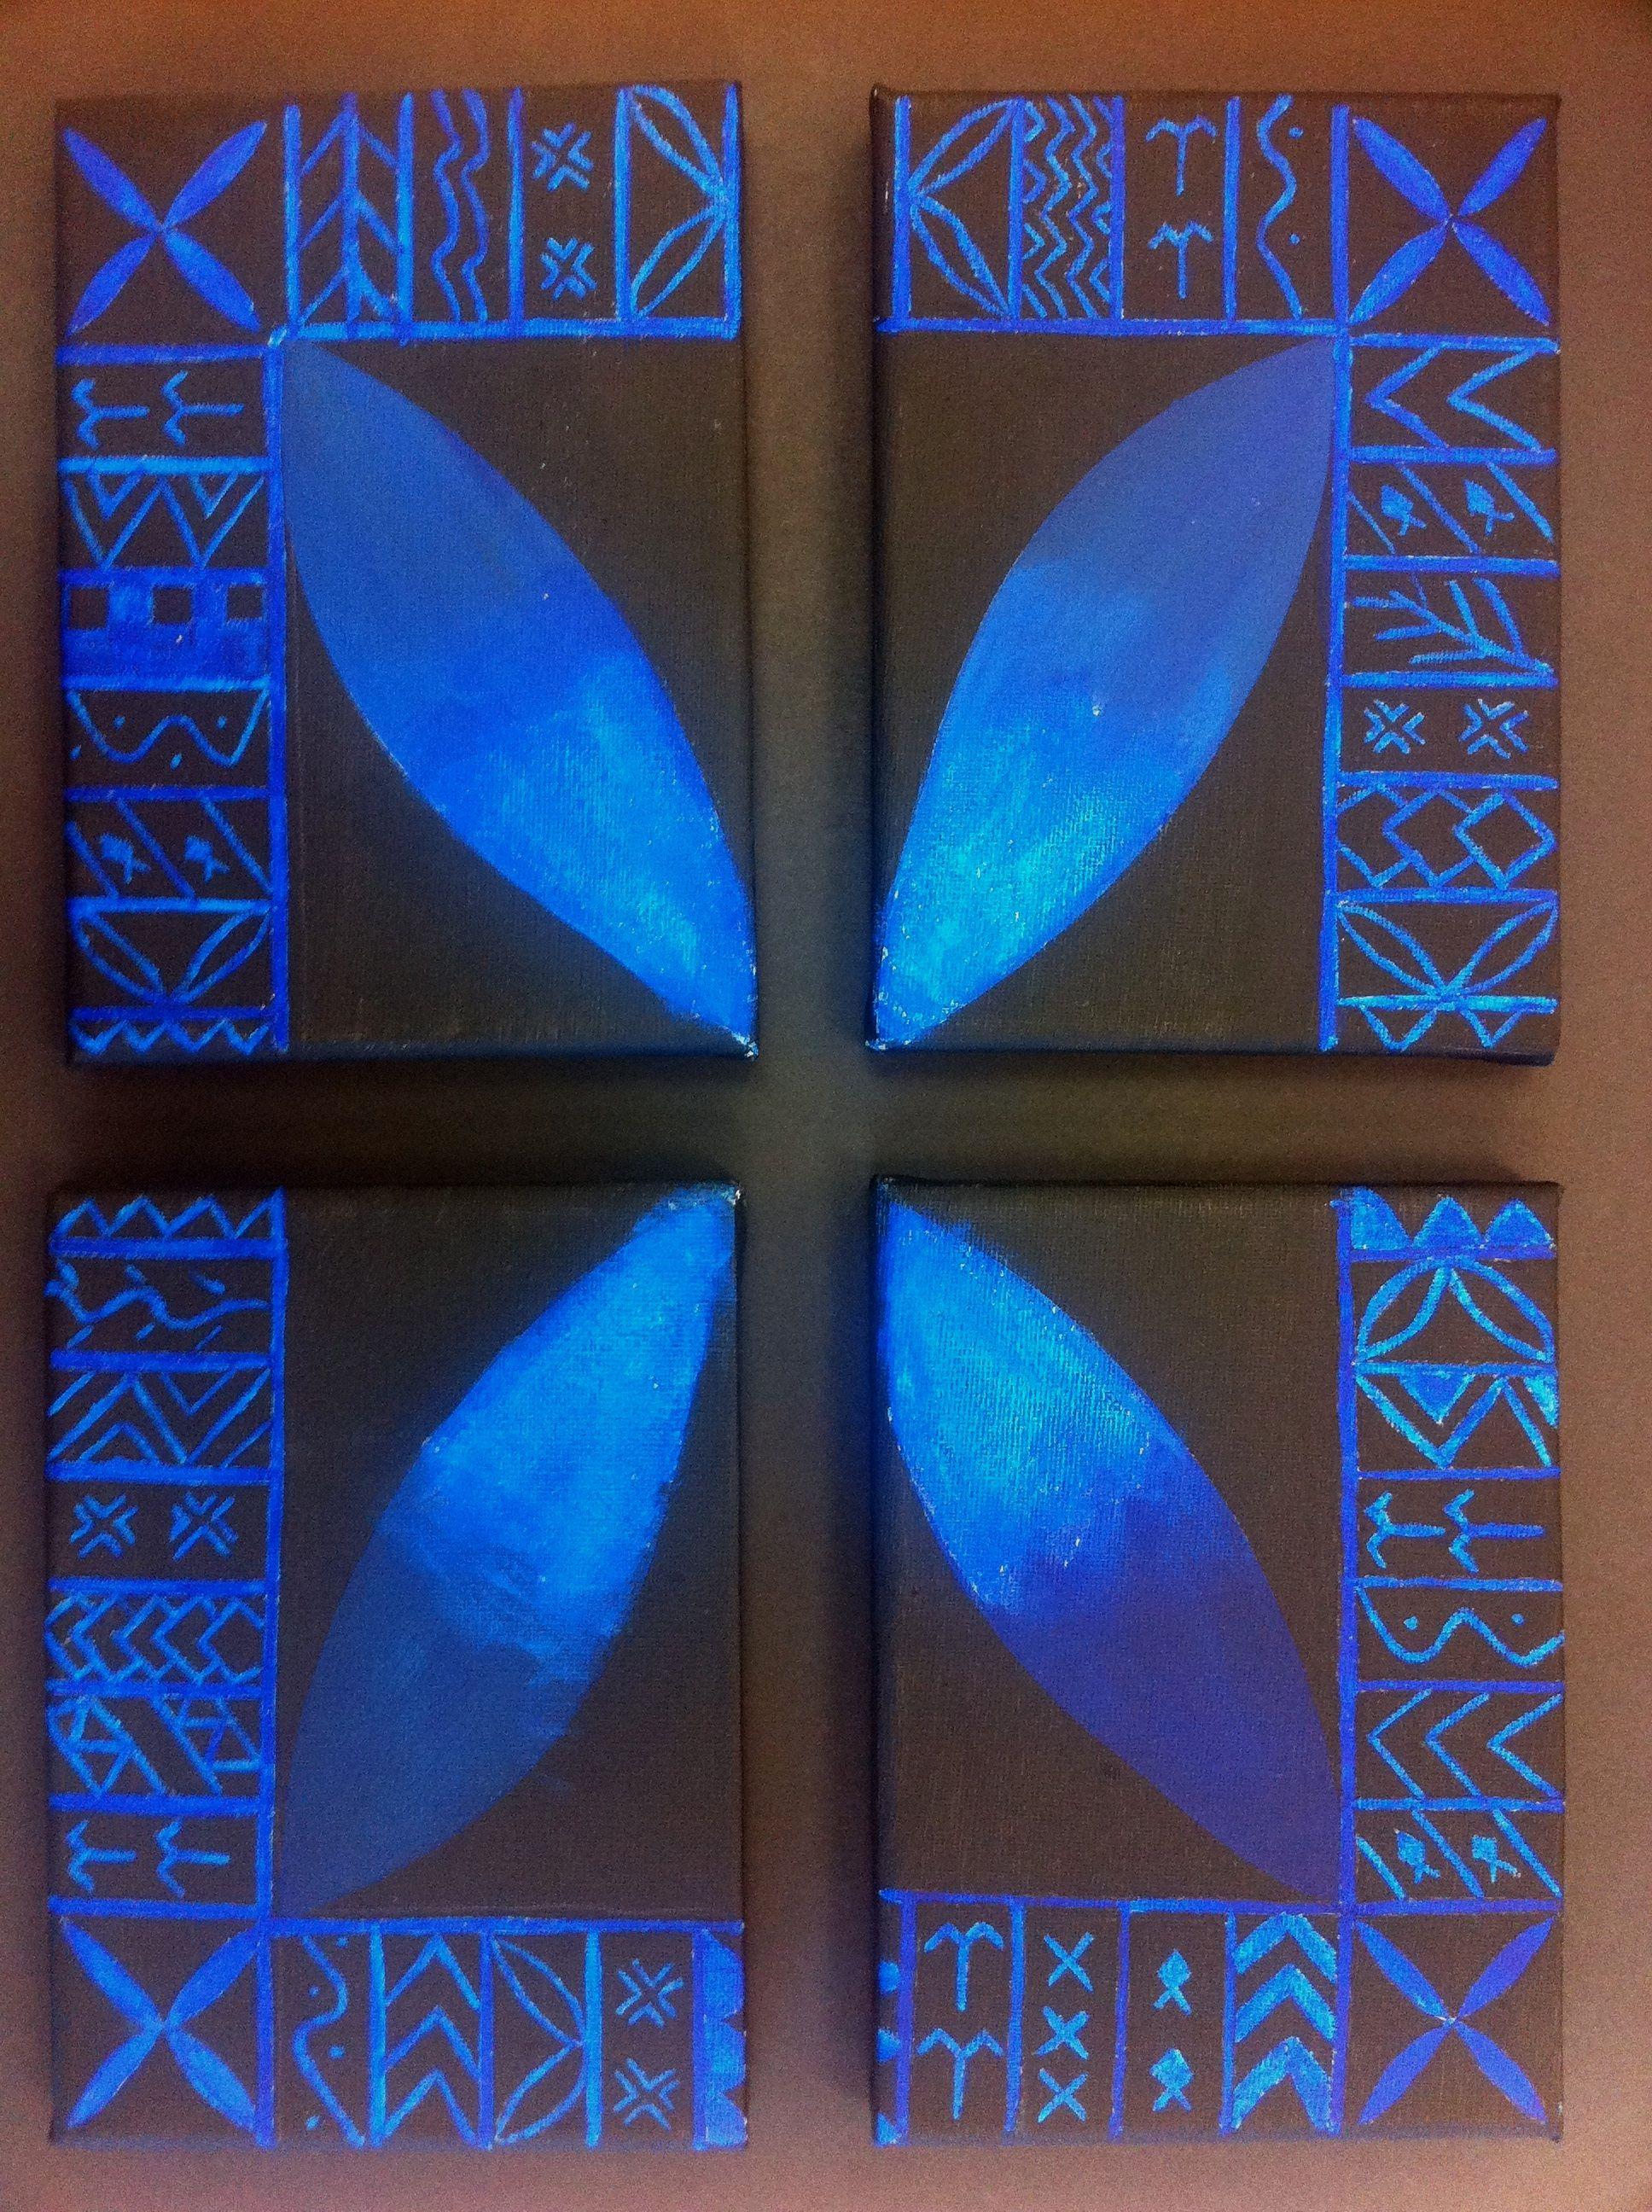 Pin By Loops On Art Craft Hobbies Polynesian Art Tribal Art Designs Maori Art